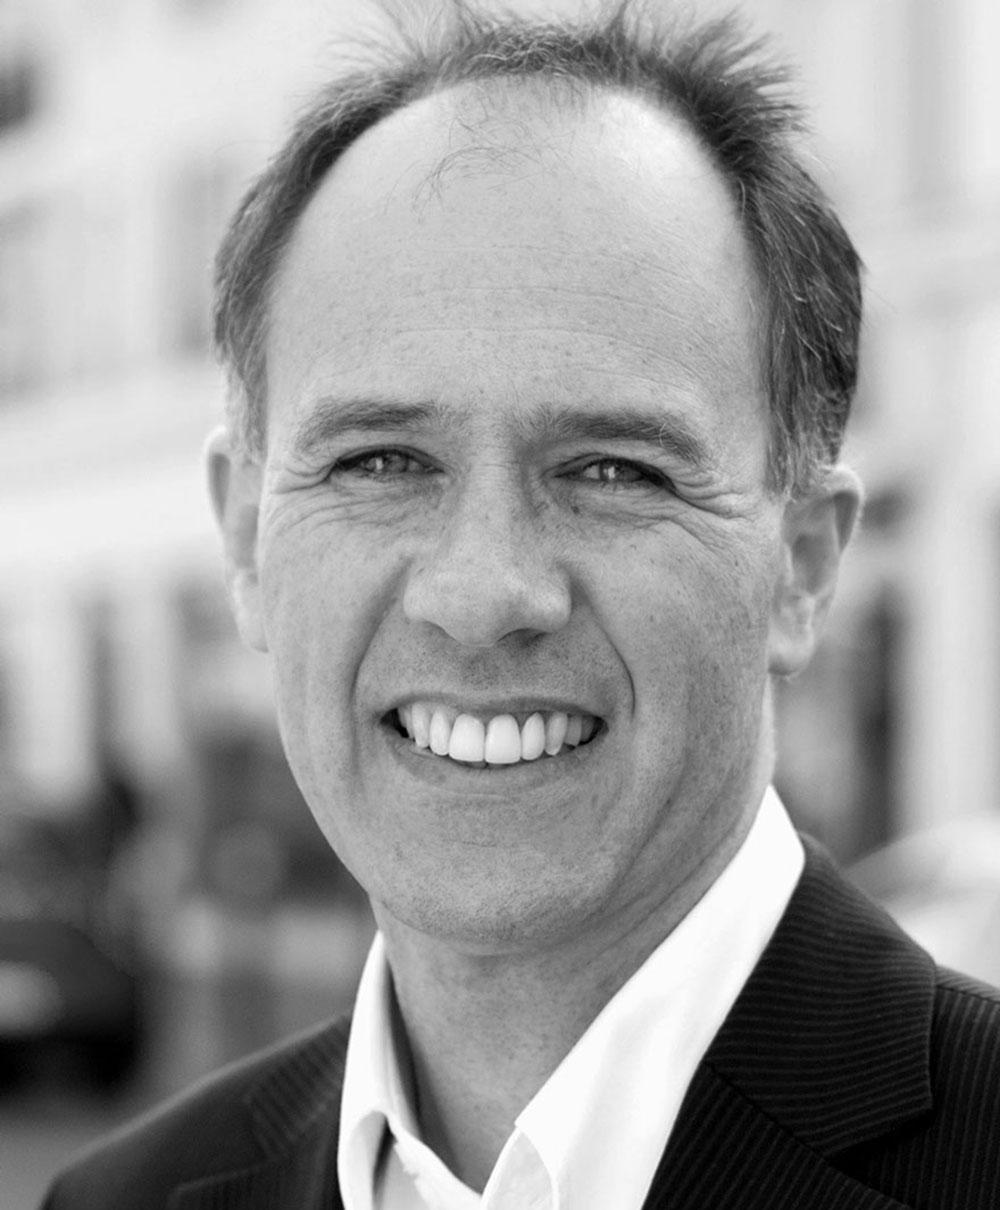 Headshot of David Kamnitzer